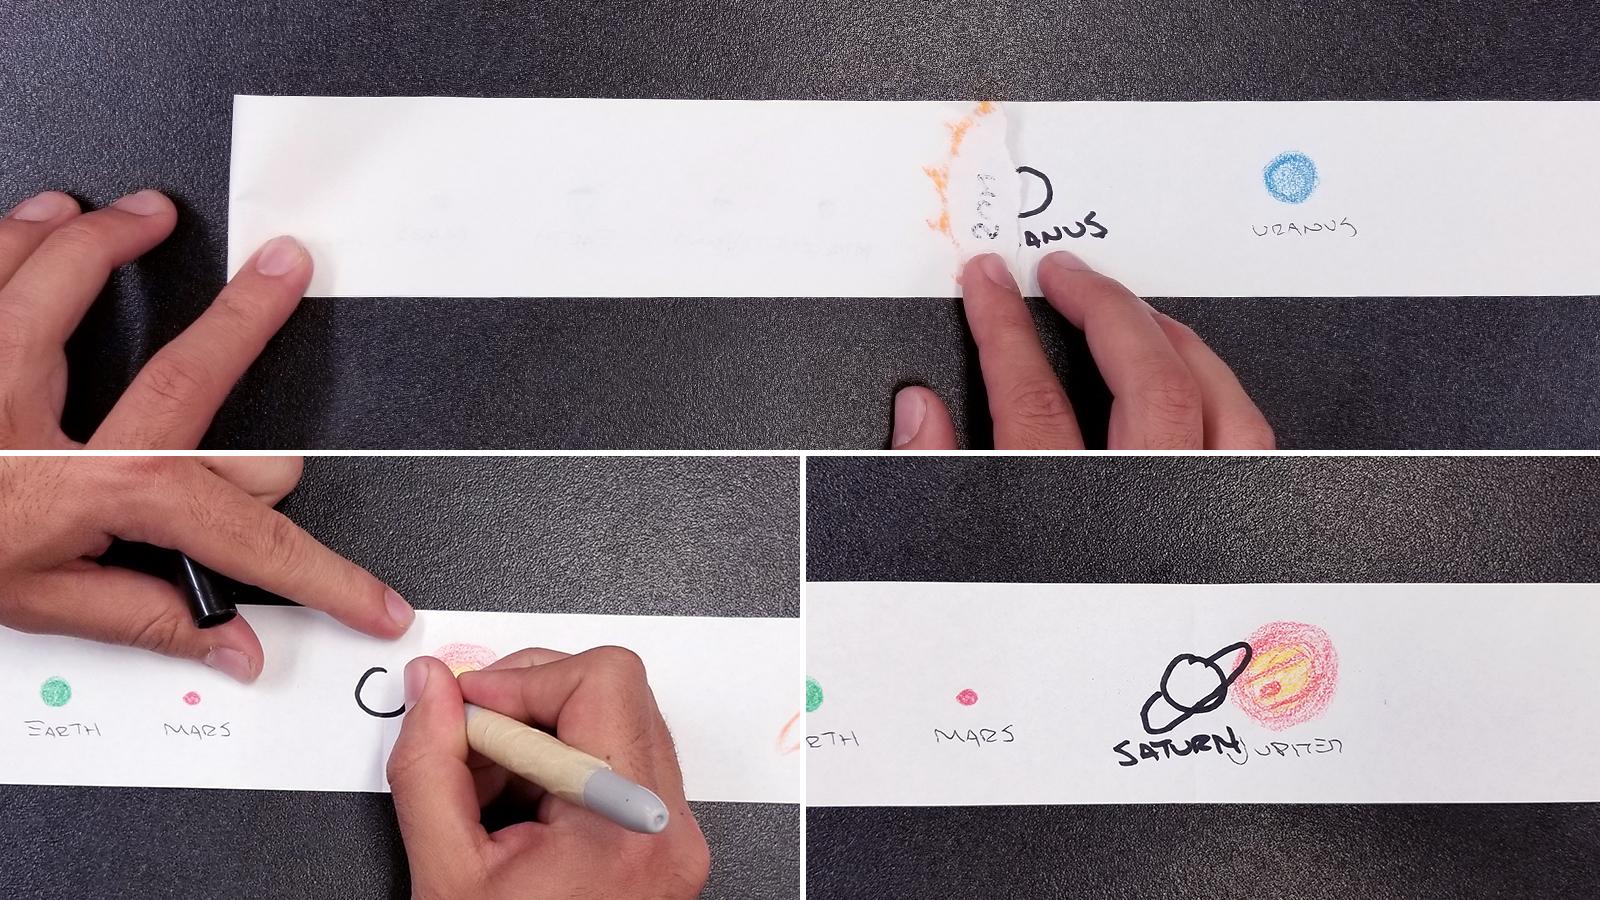 Solar System Scroll Activity - Step 4